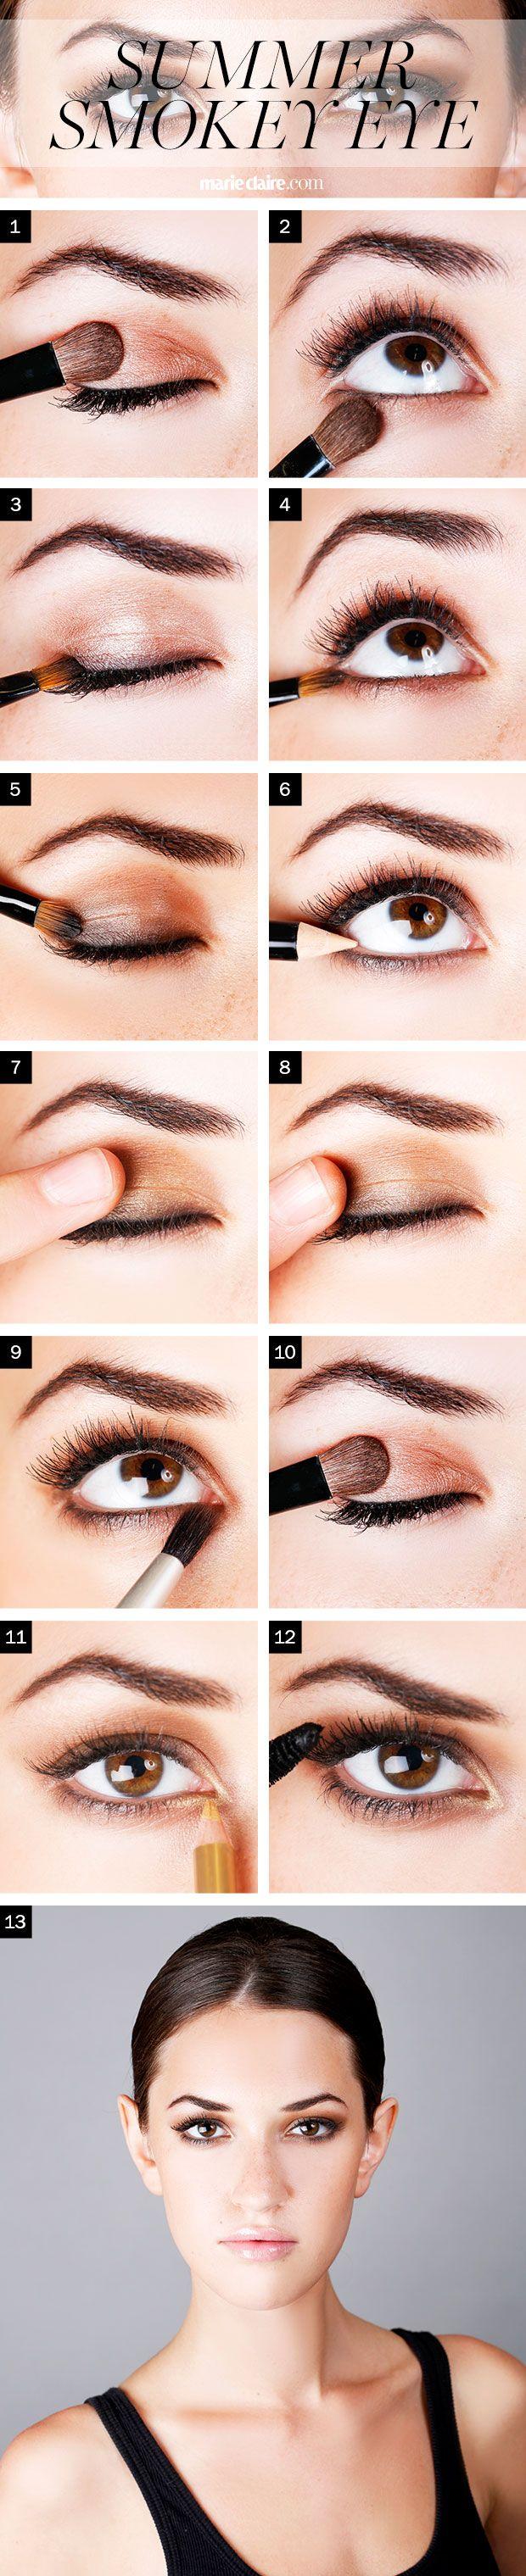 How To Get A Bronze Summer Smoky Eye Step By Step Metallic Smoky Eye